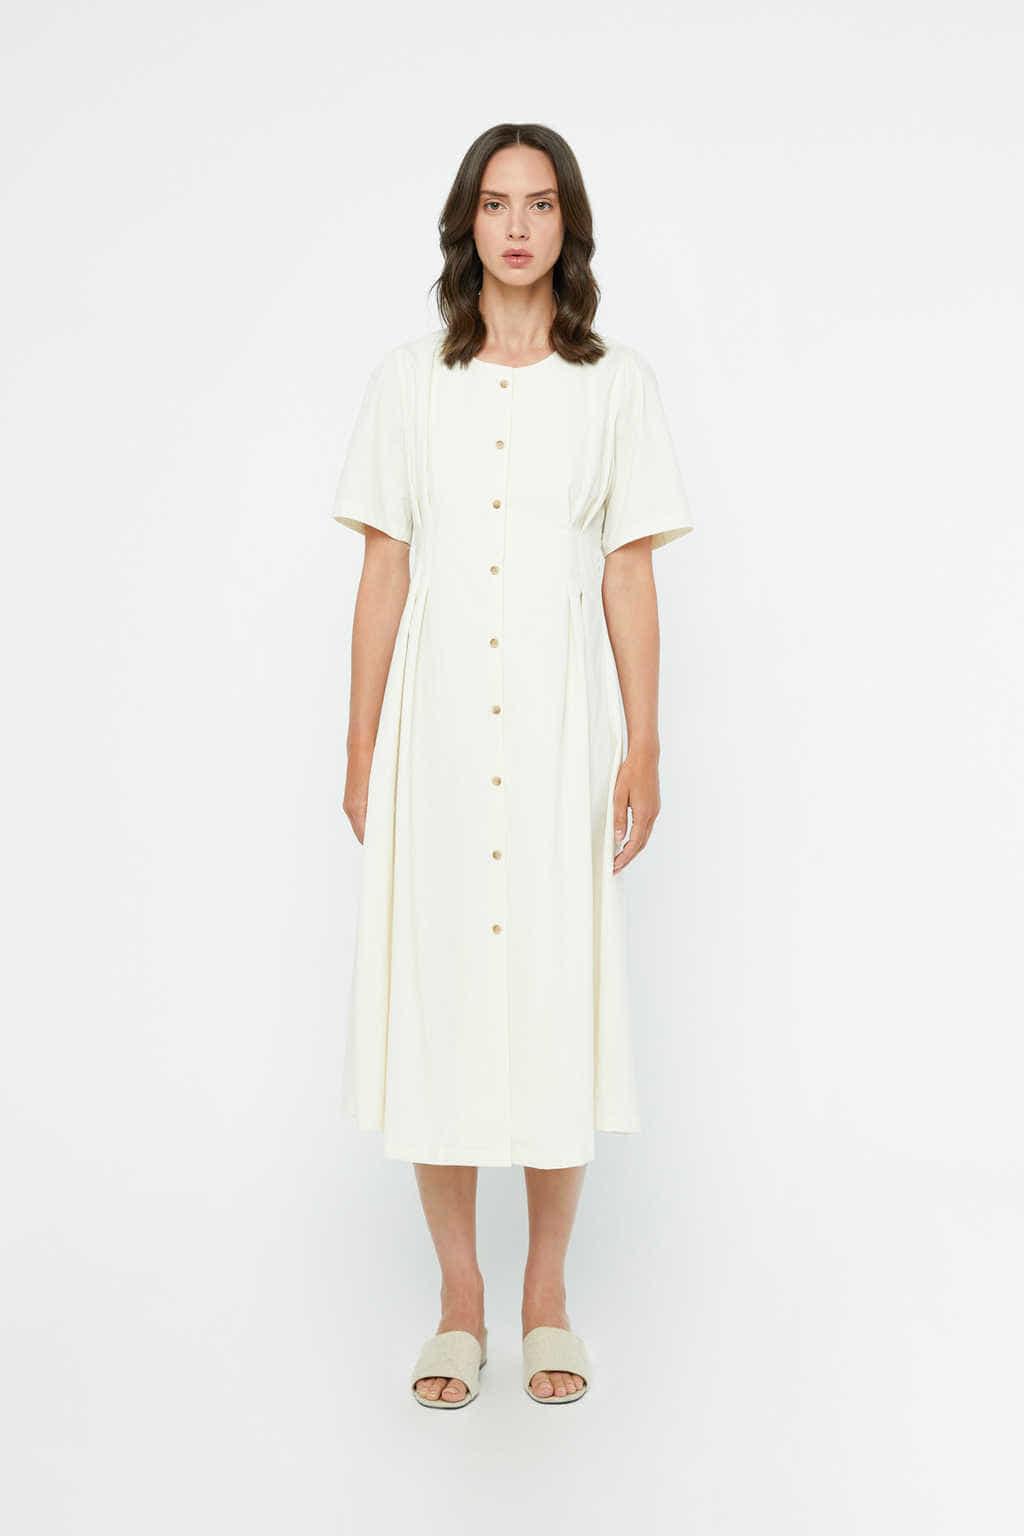 Dress K011 Cream 2